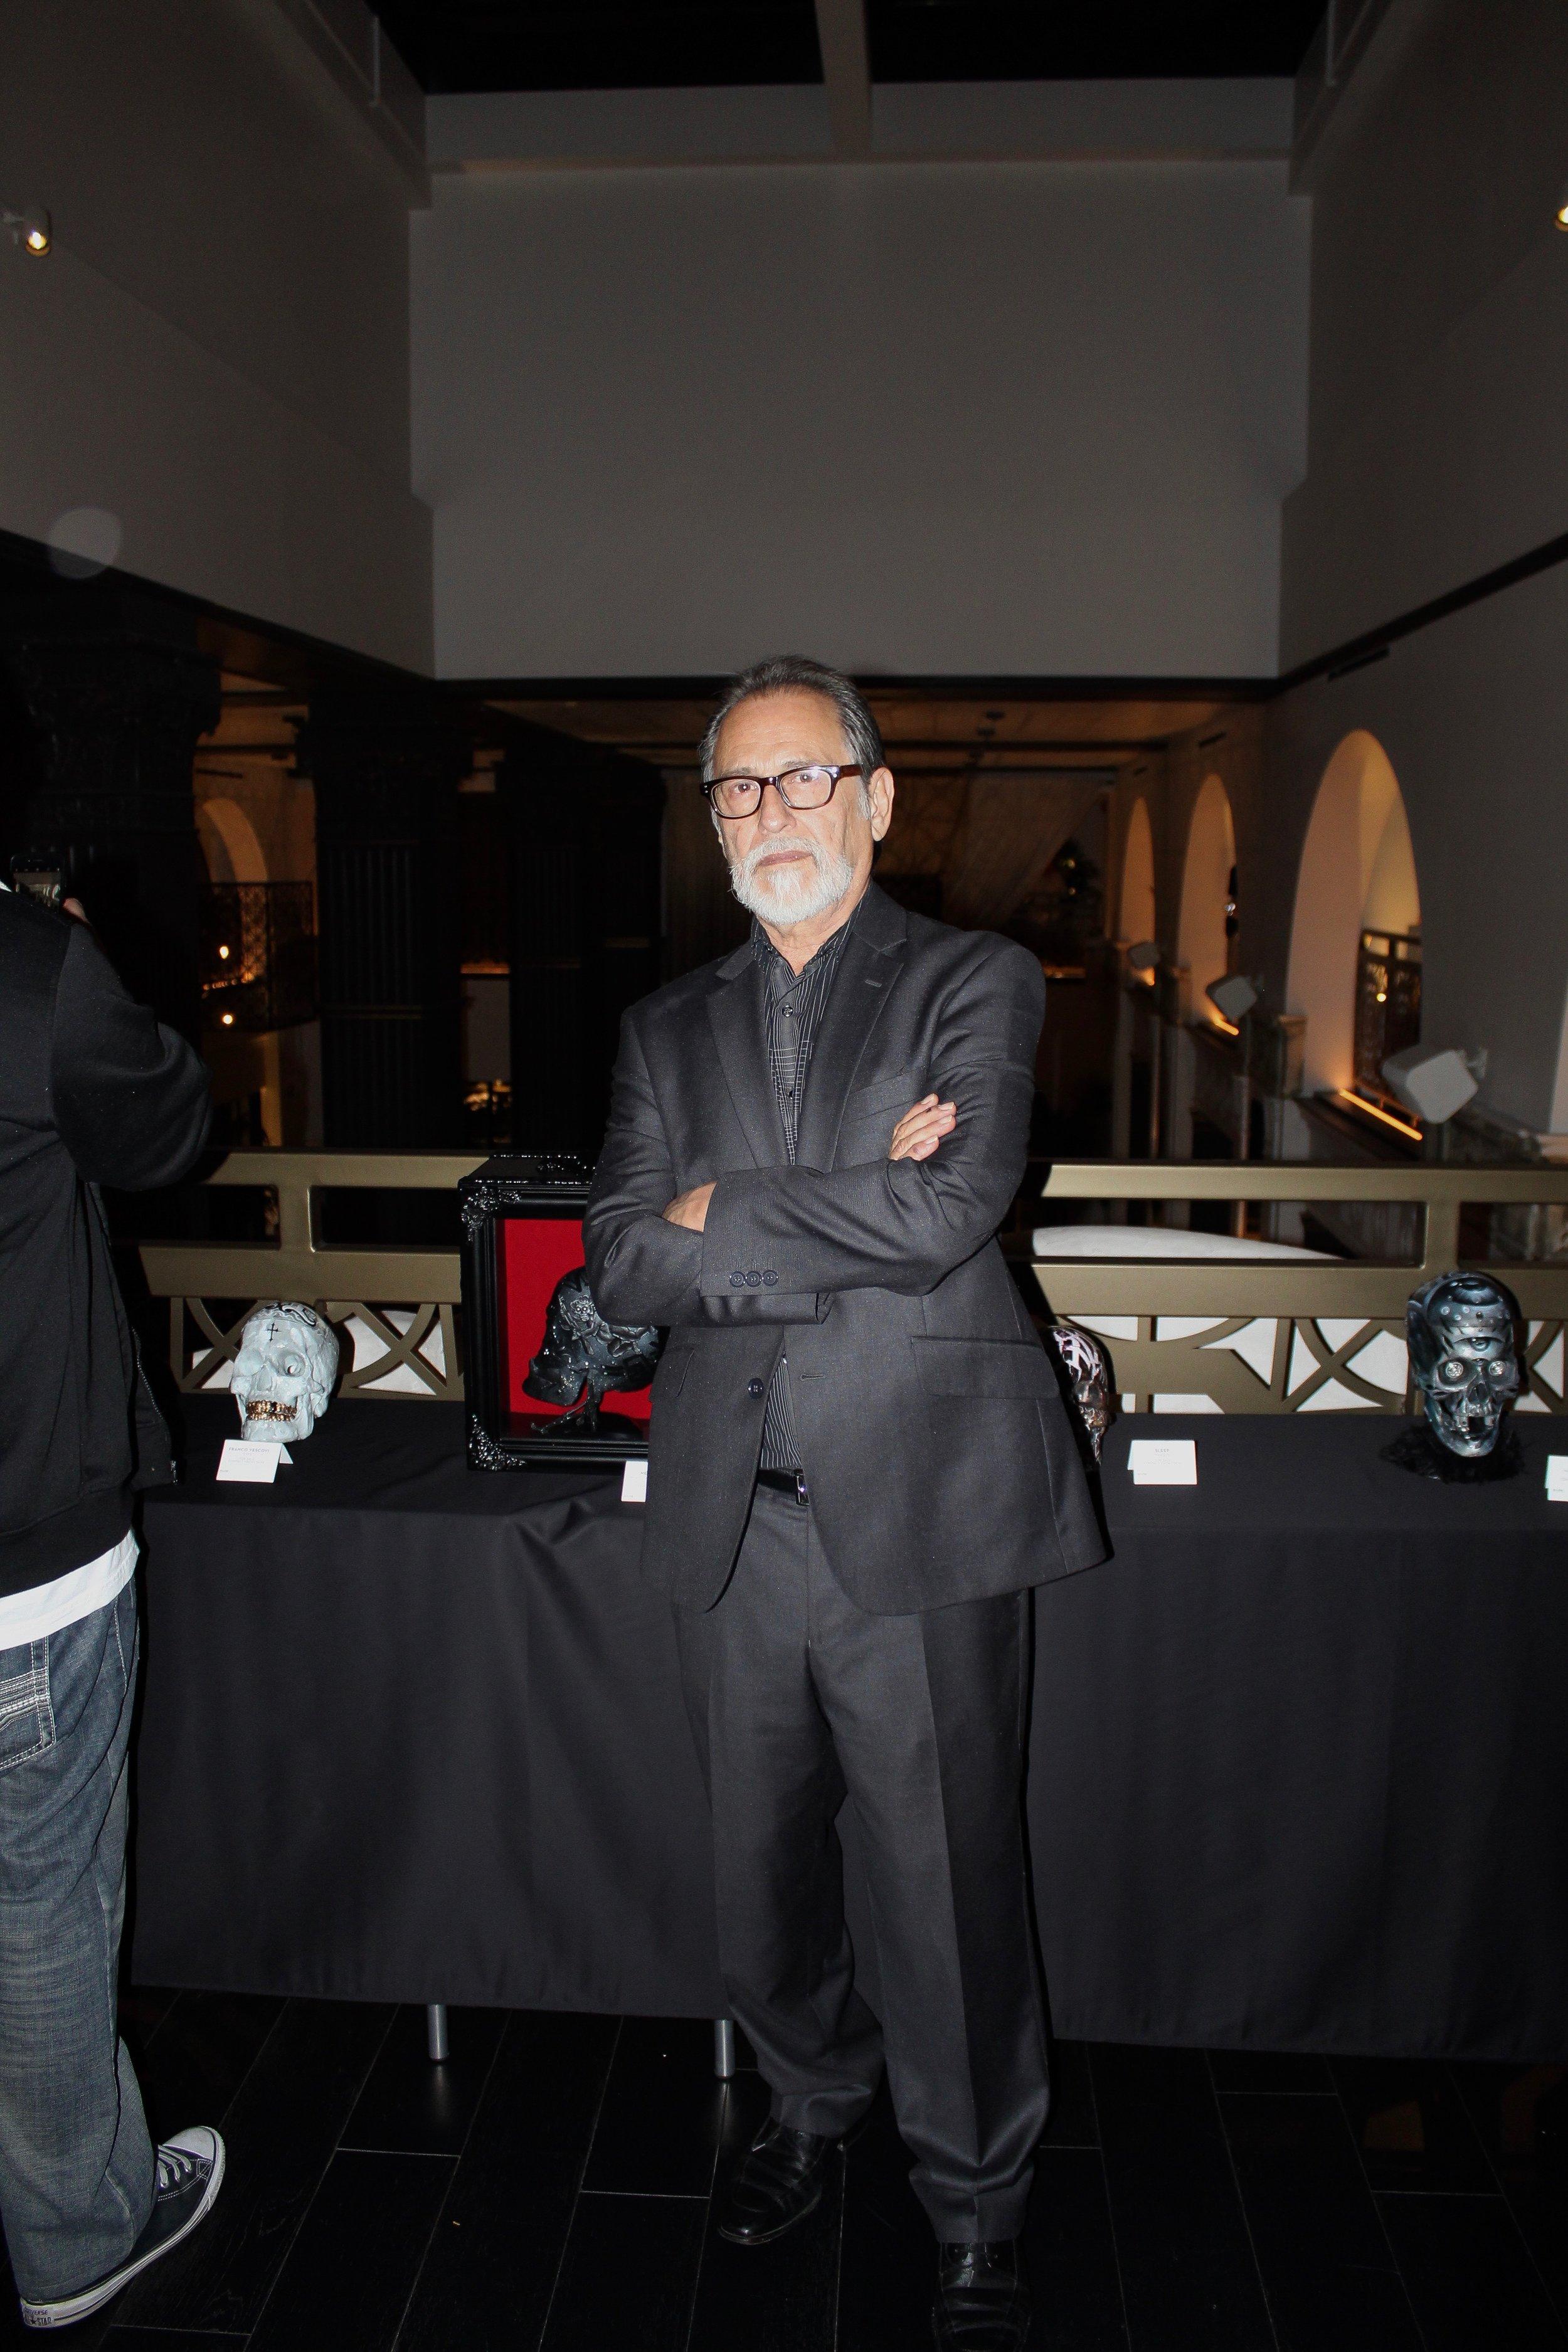 artist Chaz Bojorquez